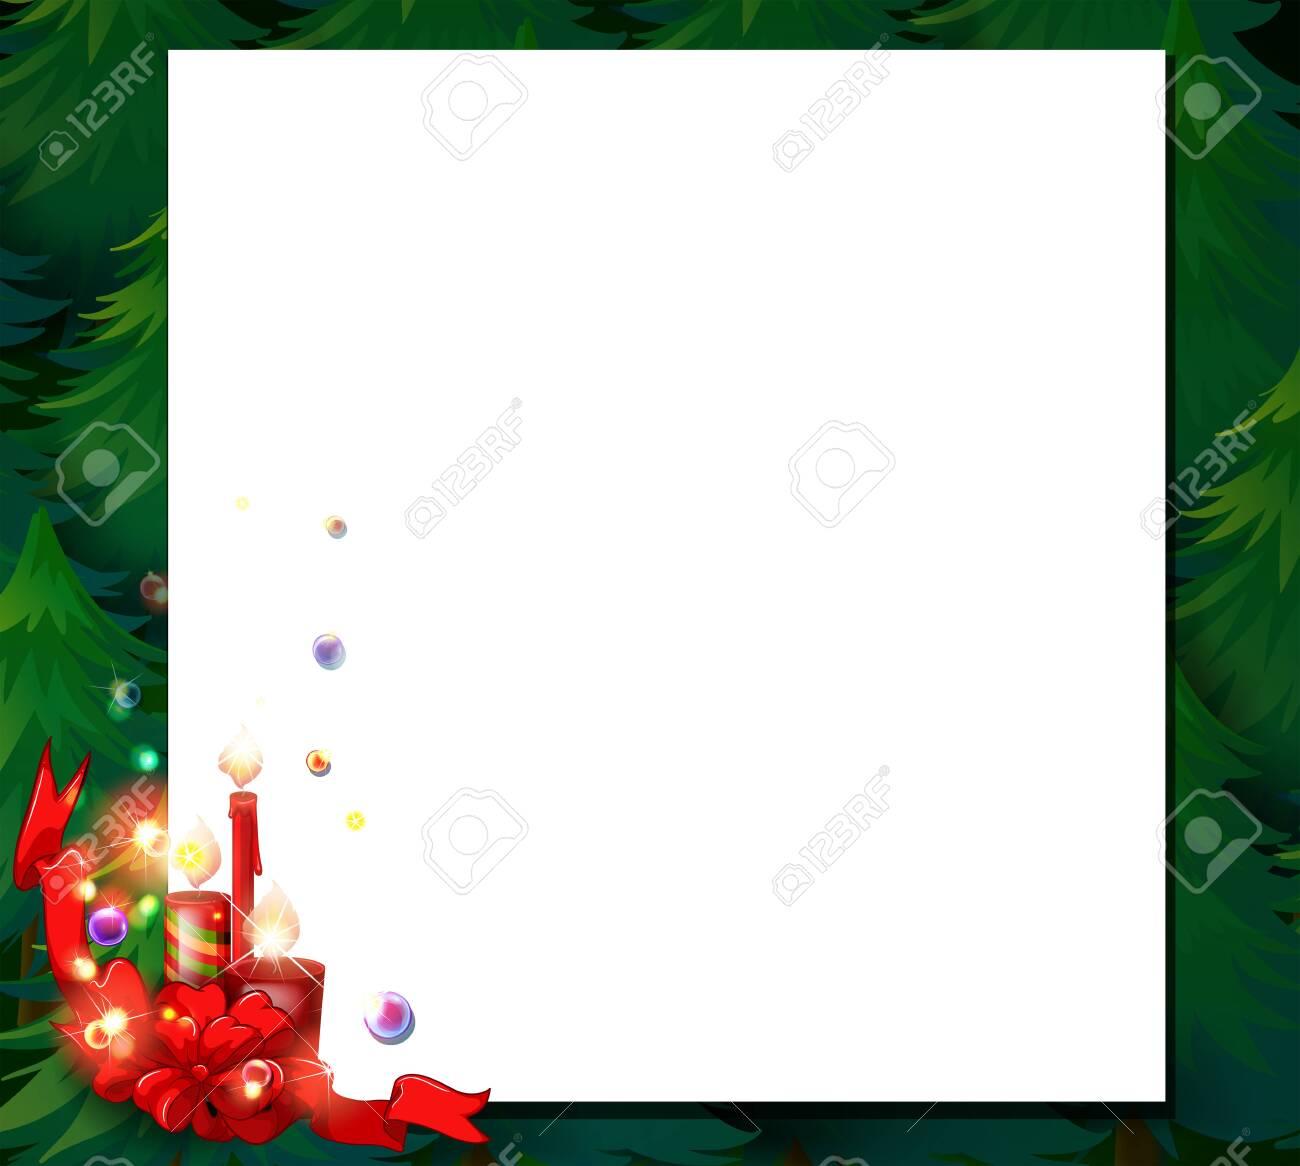 christmas menu stock photos images royalty christmas menu christmas menu illustration of an empty christmas card template